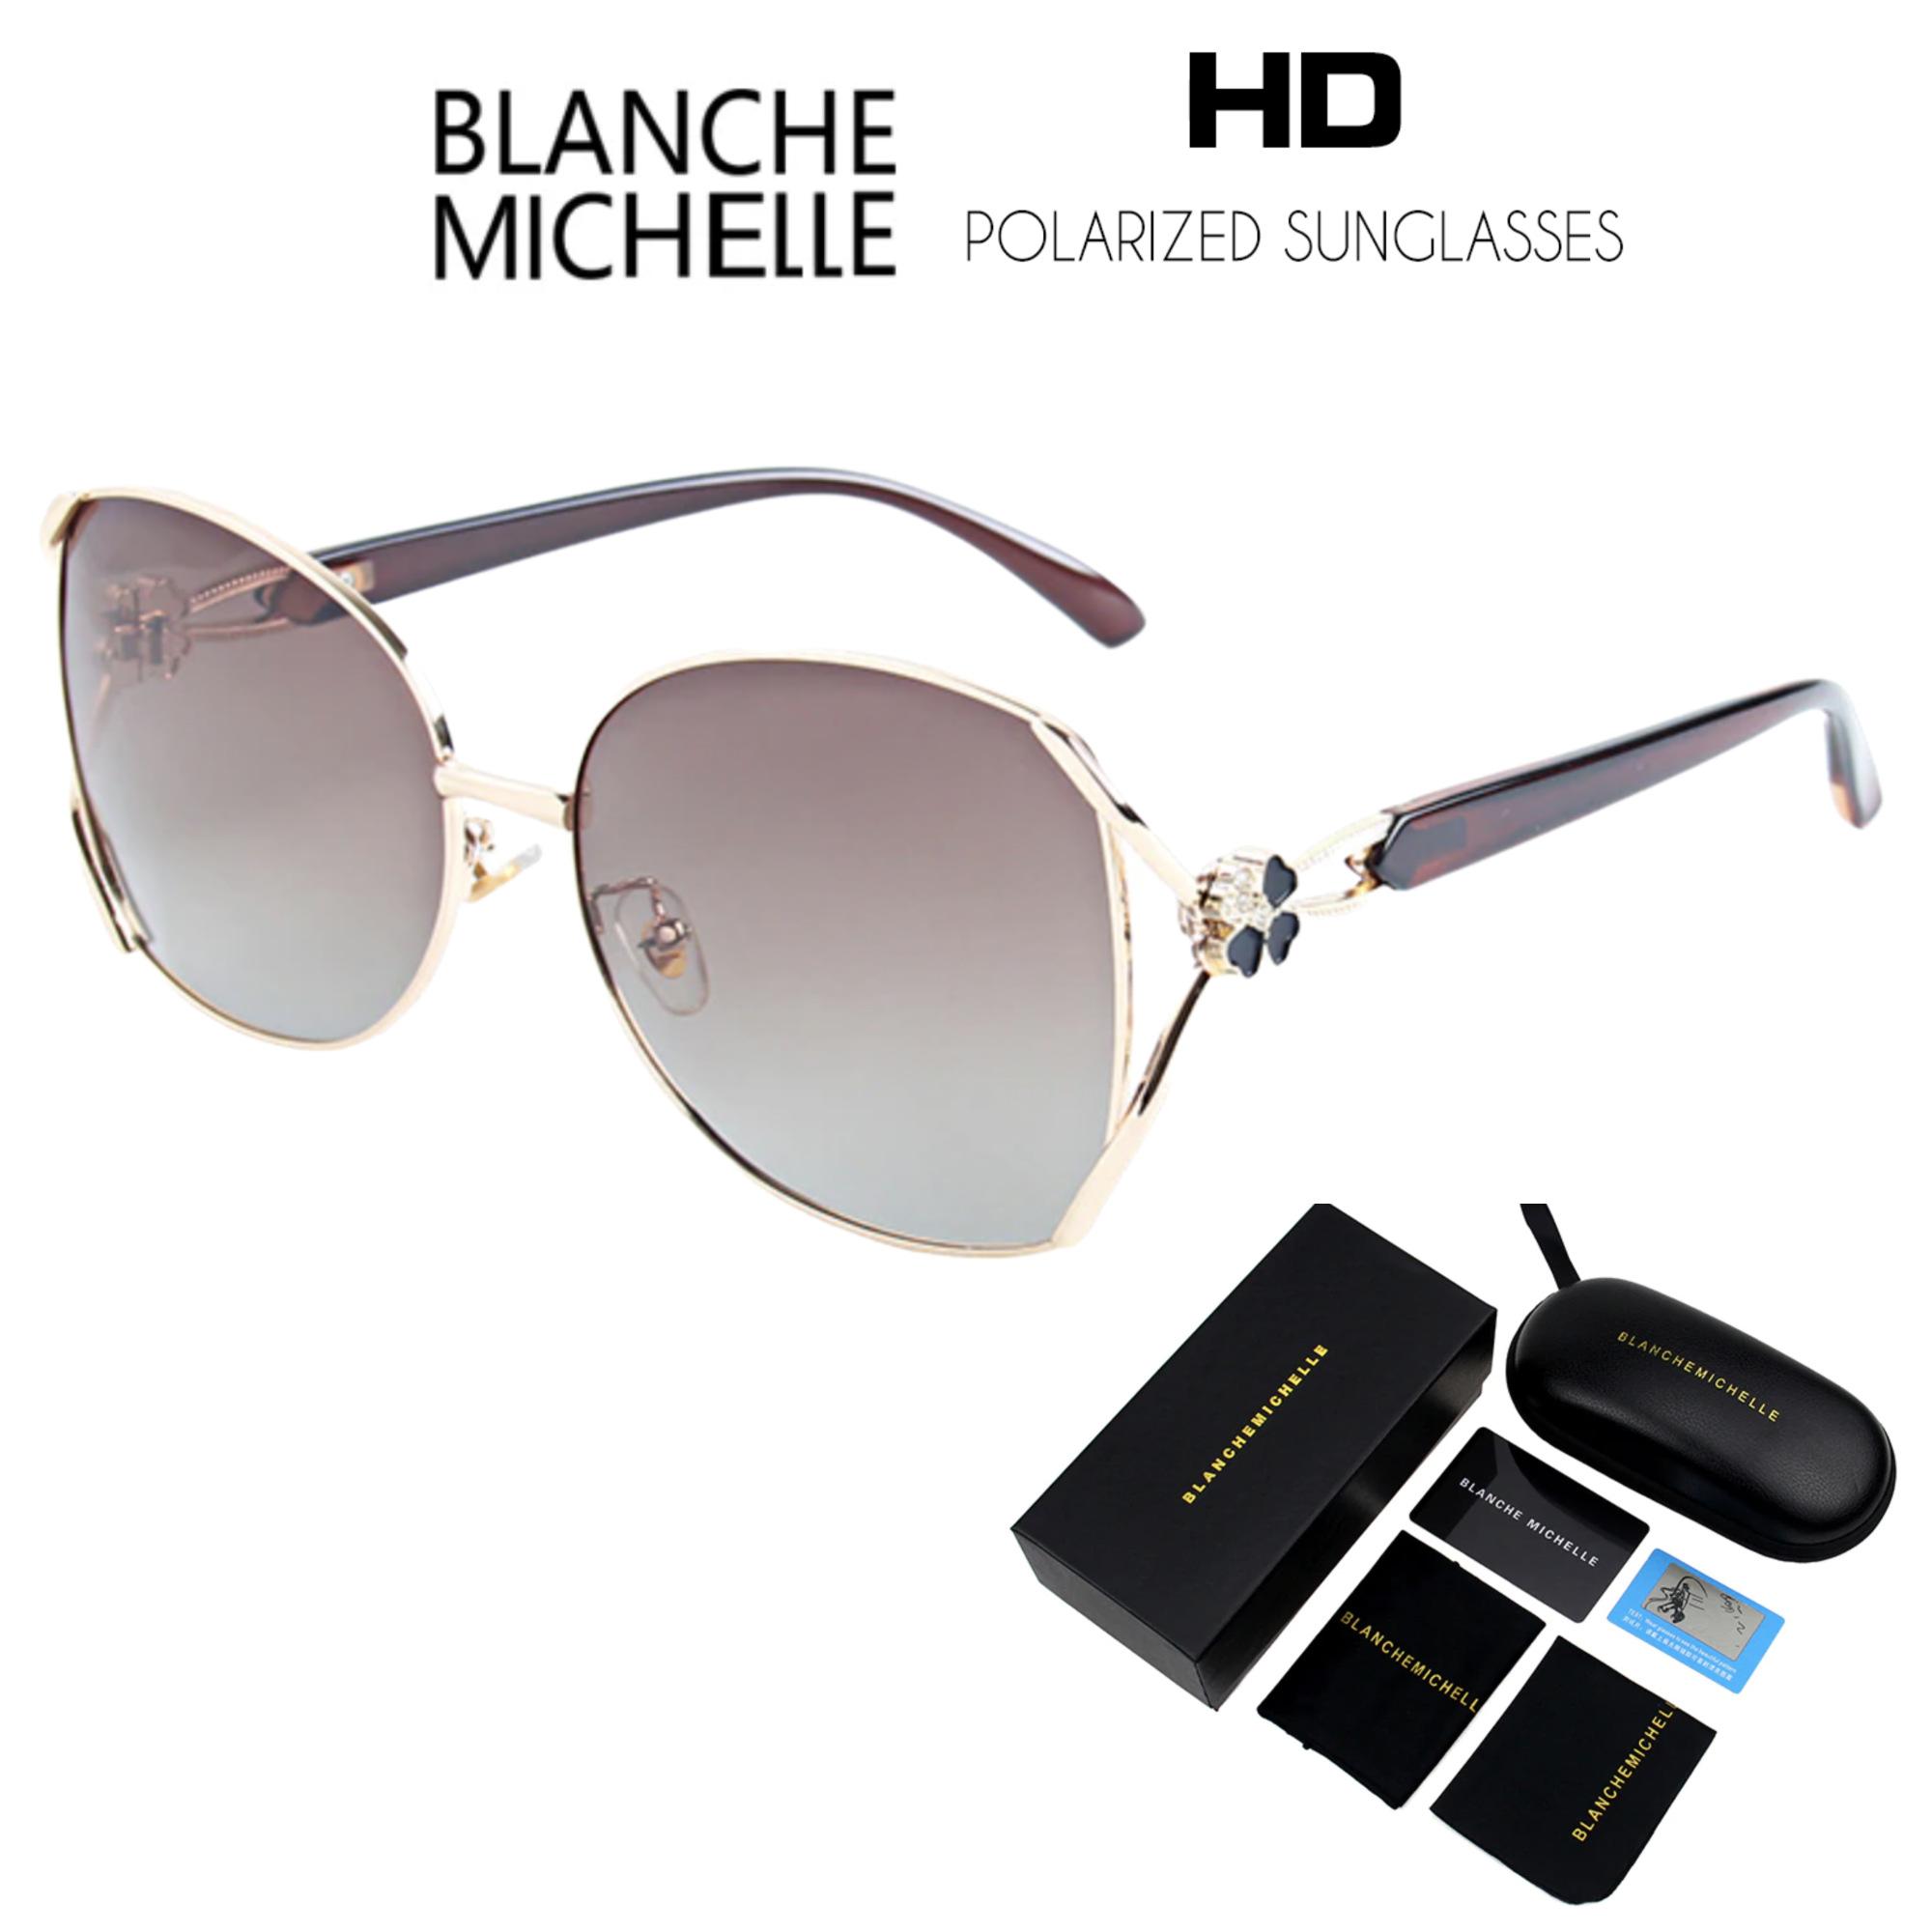 Óculos de Sol Feminino Lente Polarizada UV400 - Blanche  Michelle - BM5213